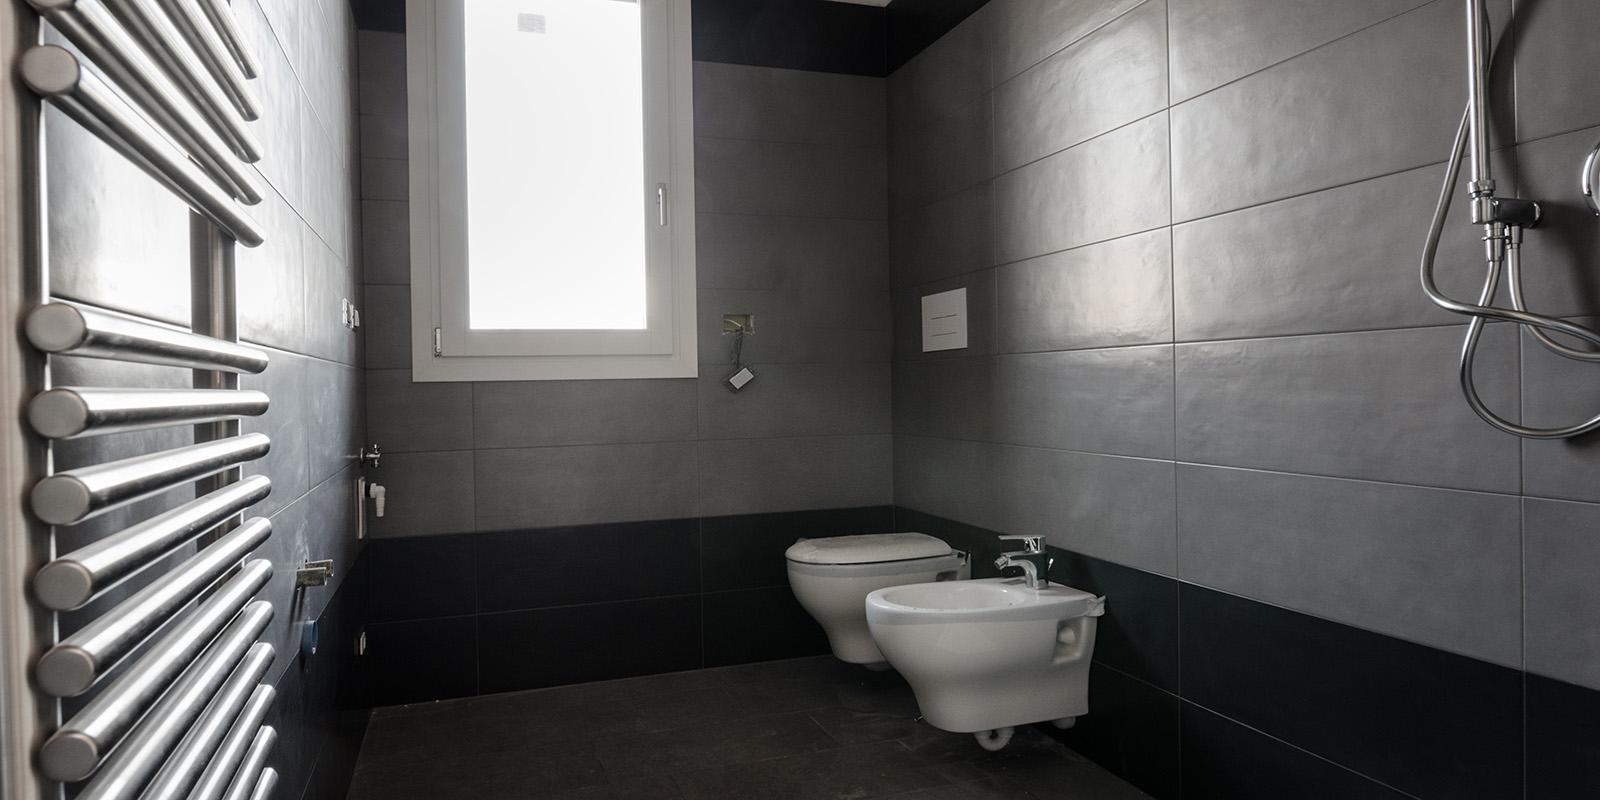 Epis_Bagnatica_Residenza_del_Sole_5